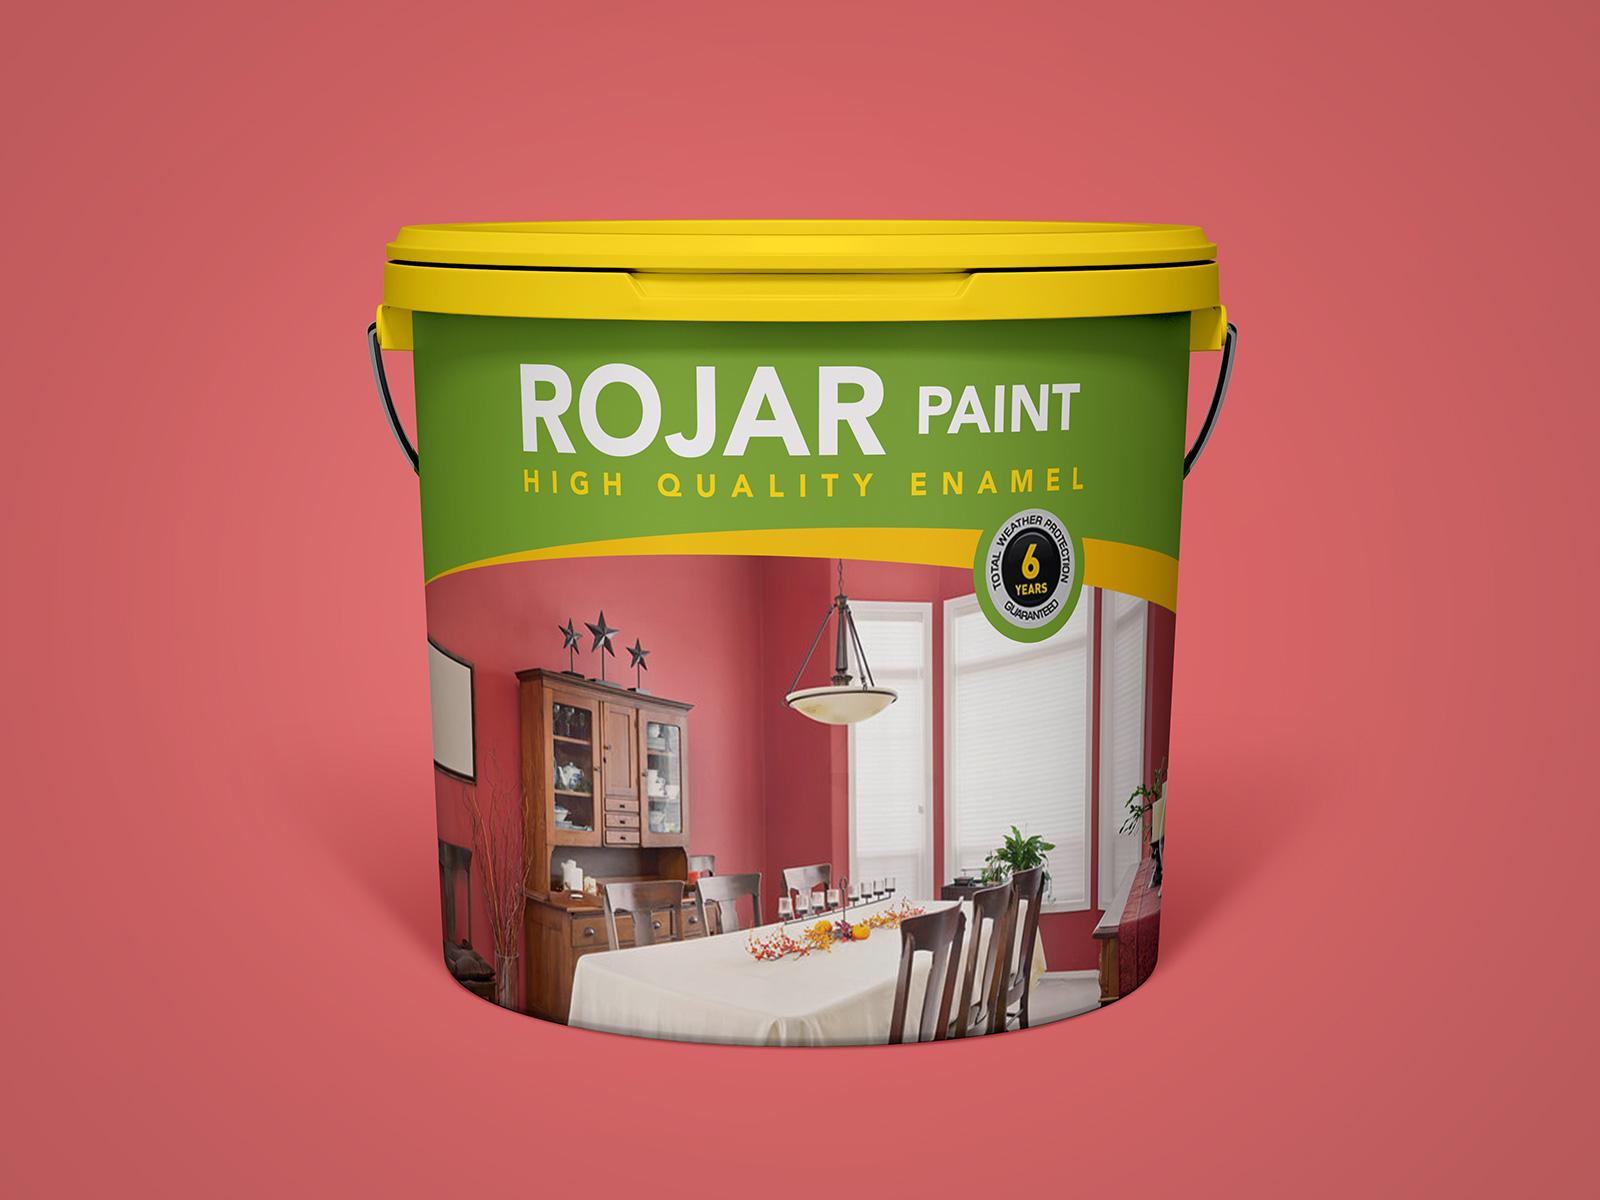 Free-5-Gallon-Paint-Bucket-Mockup-PSD-2